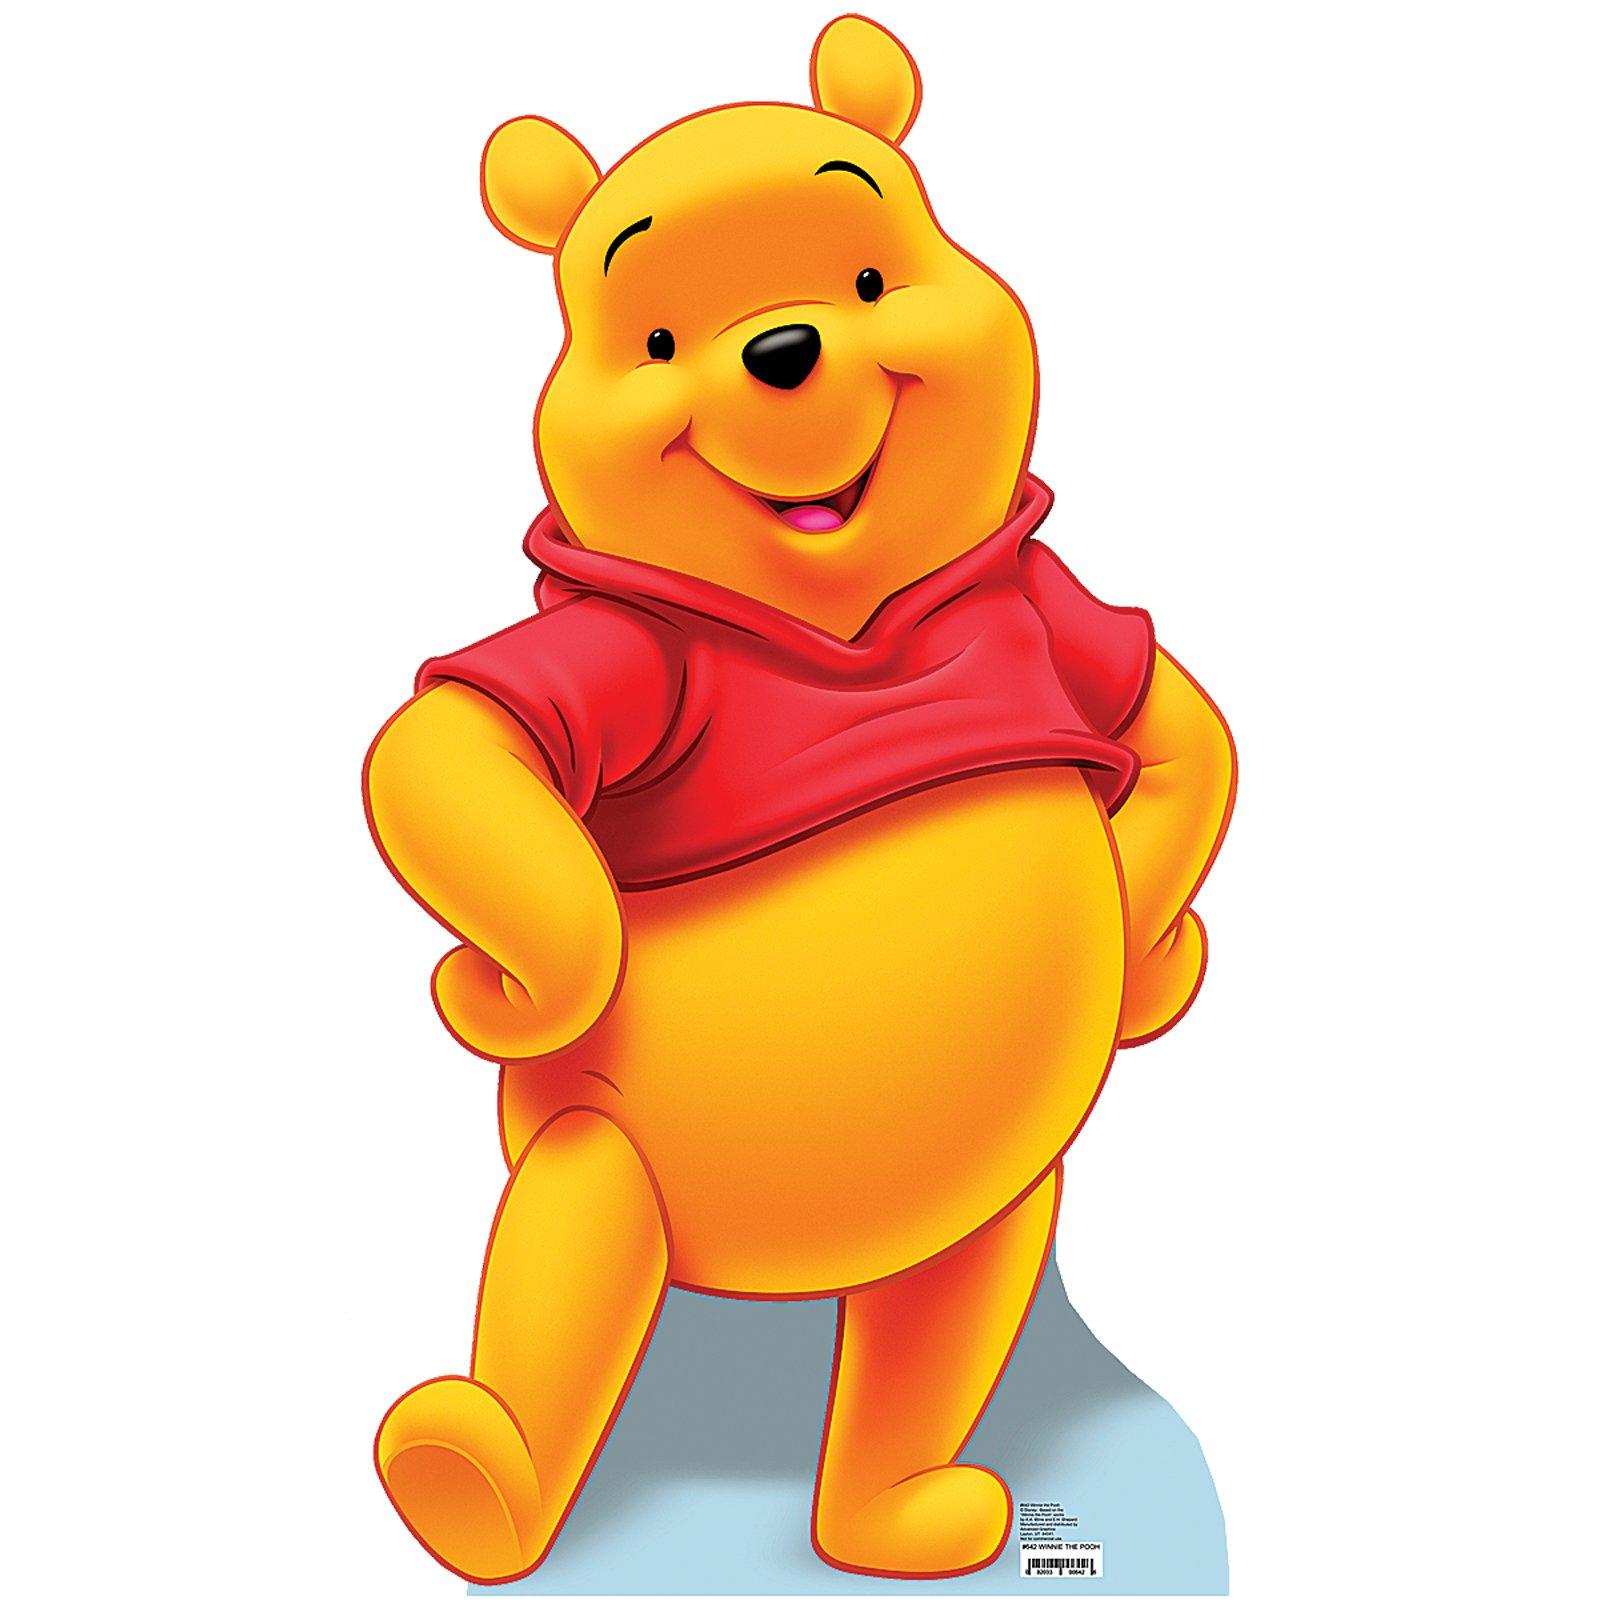 Pooh Bear, Winnie the Pooh.